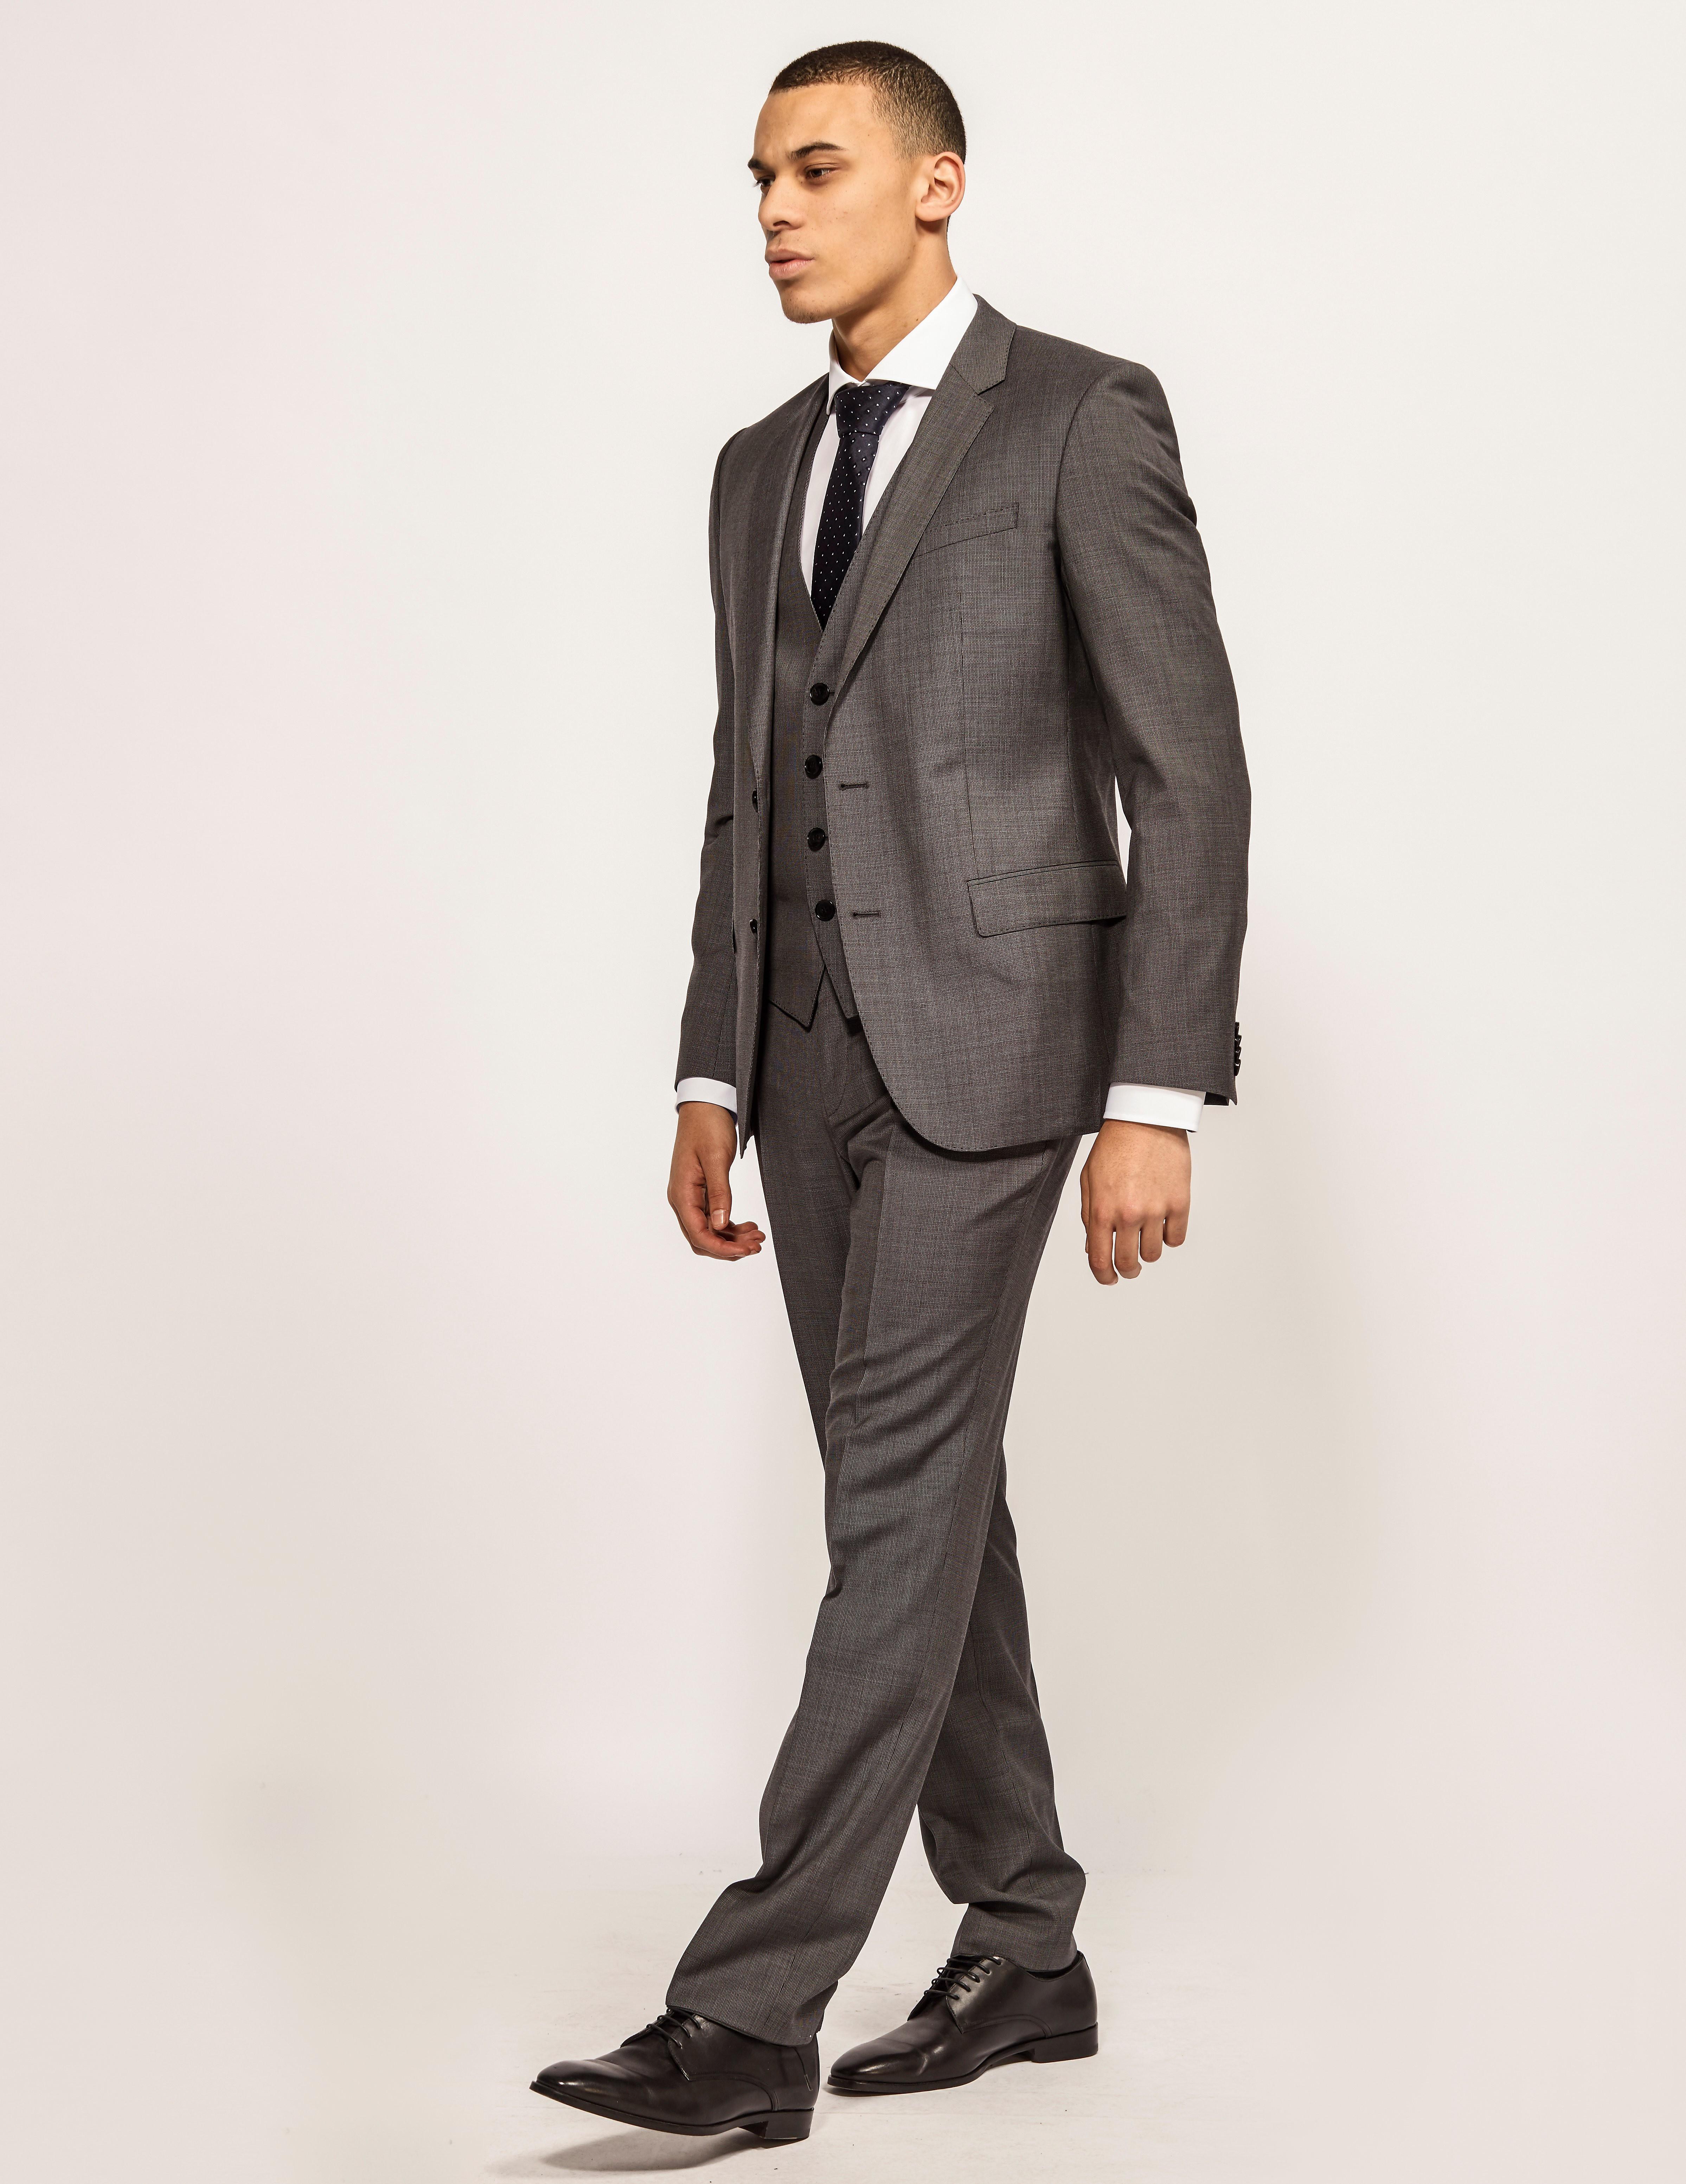 BOSS Genius Three Piece Suit